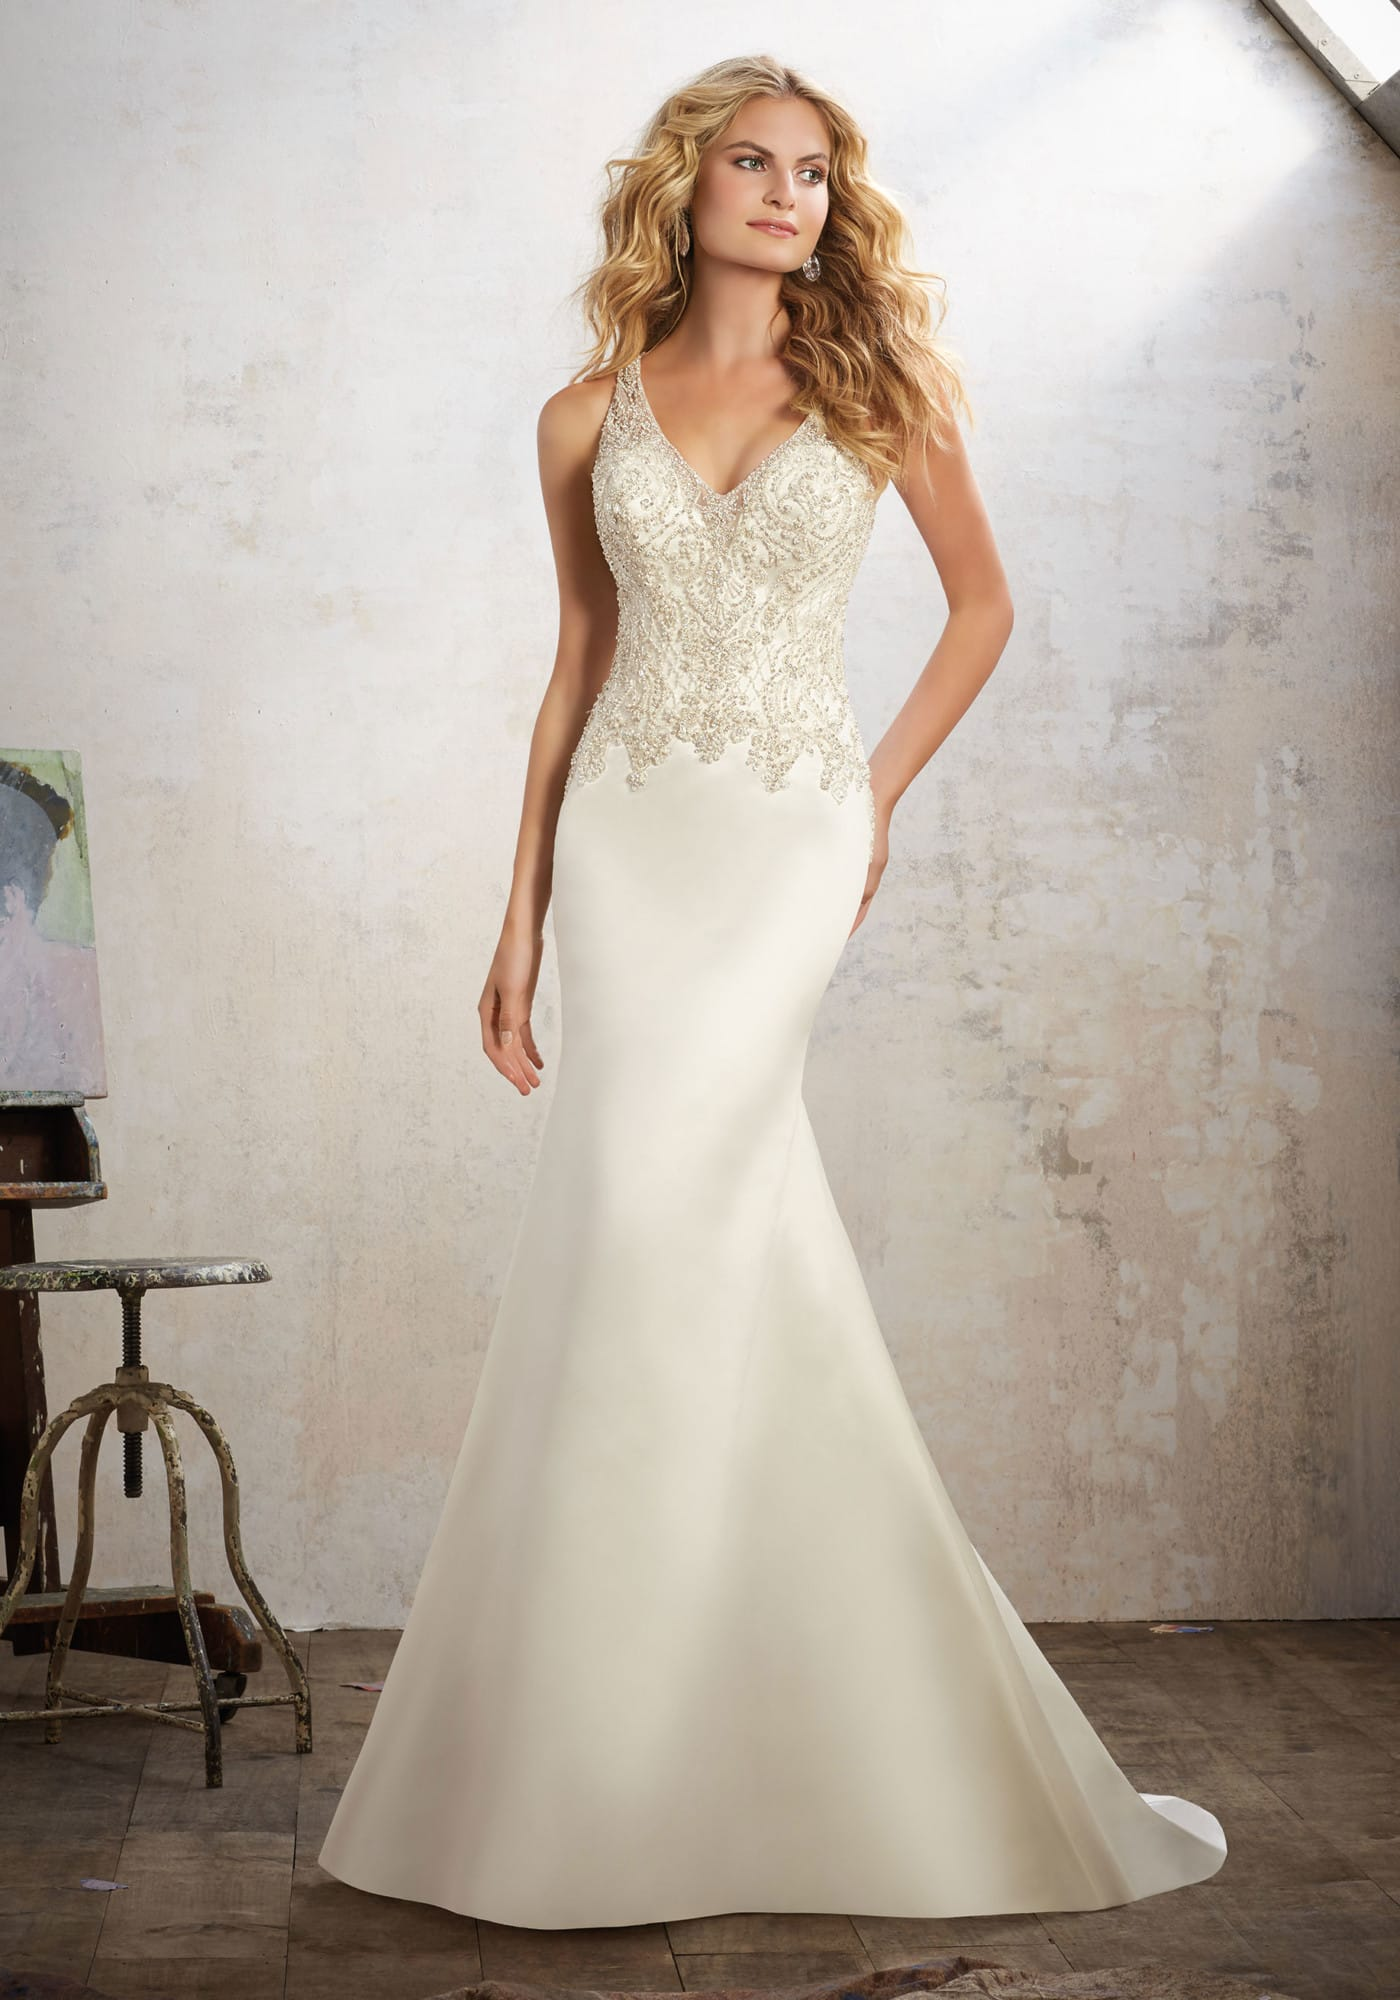 Morilee 8121 Maria Dress